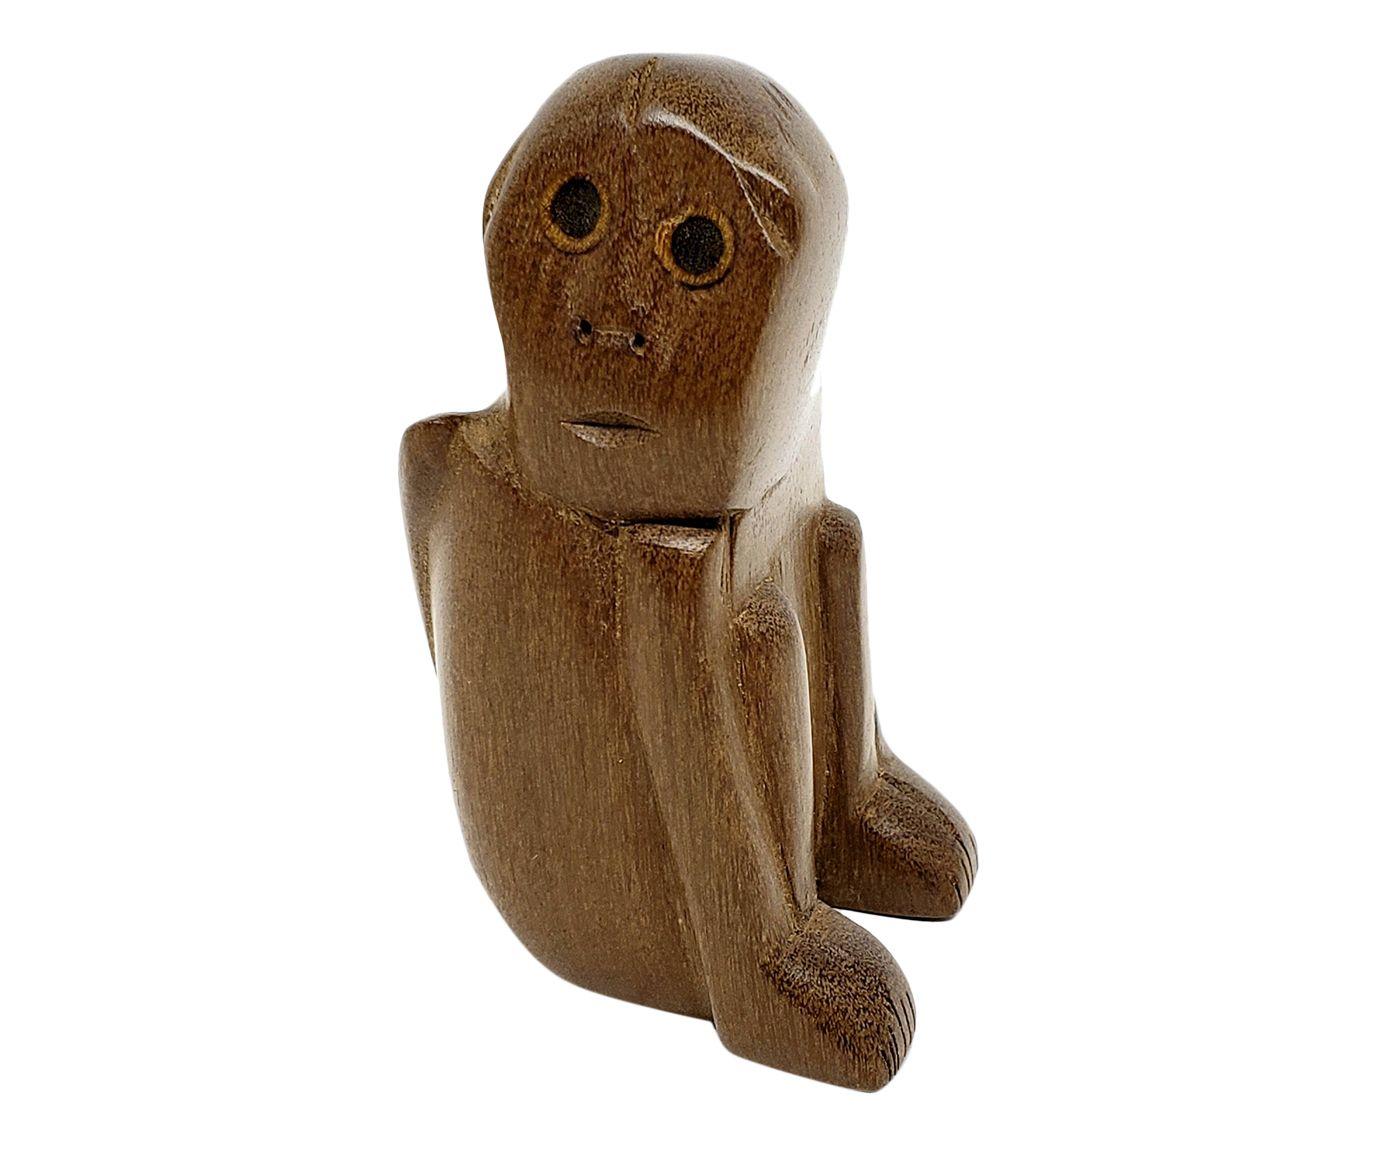 Escultura Macaco - 10cm   Westwing.com.br